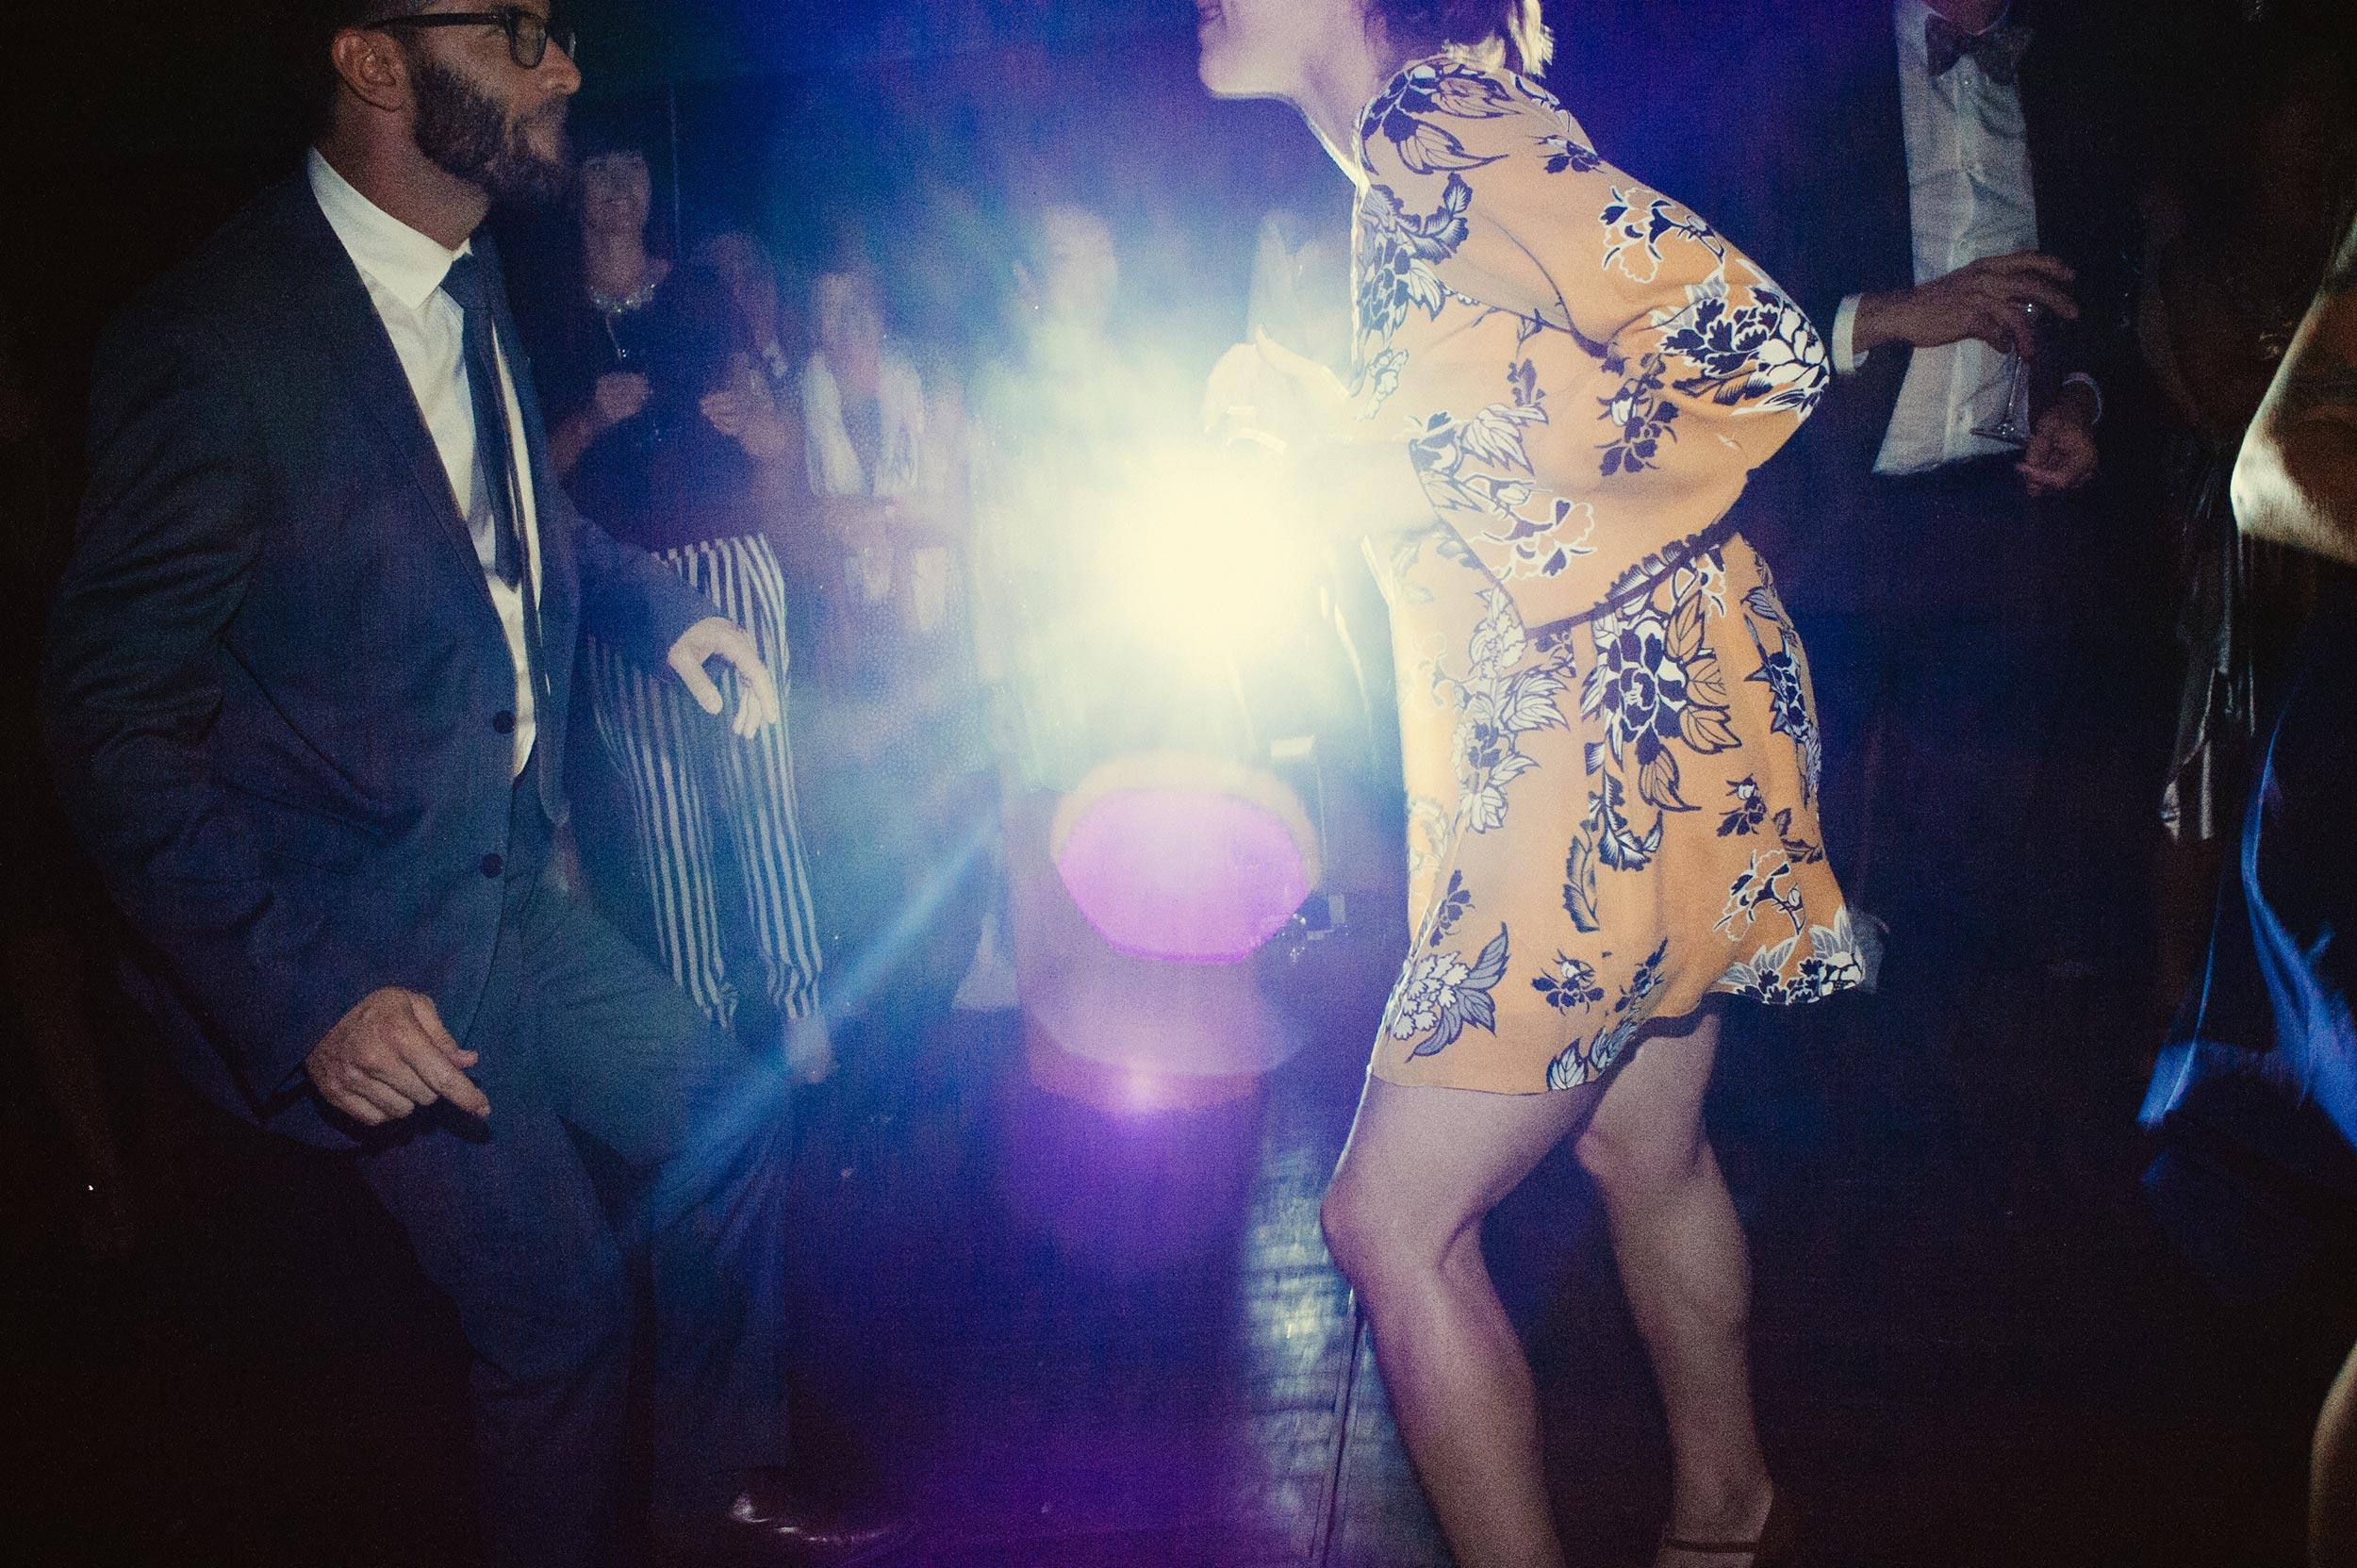 2016-Davor-Chiara-Monferrato-Asti-Vercelli-Wedding-Photographer-Italy-Alessandro-Avenali-98.jpg